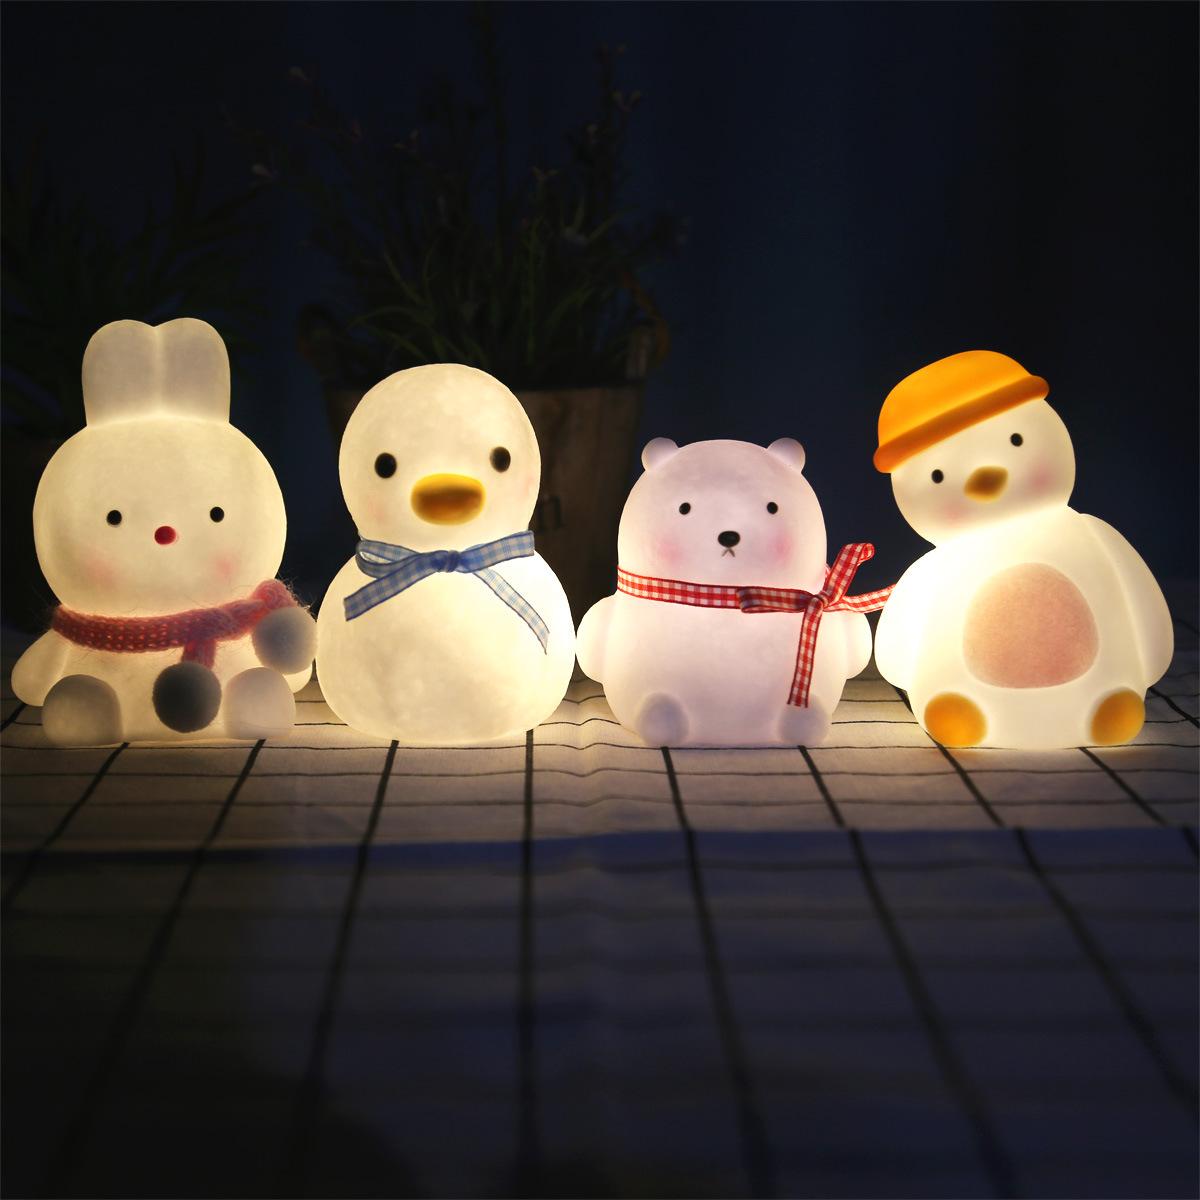 Explosive led vinyl night light duck cartoon ins creative ornaments night market stall supplies nigh